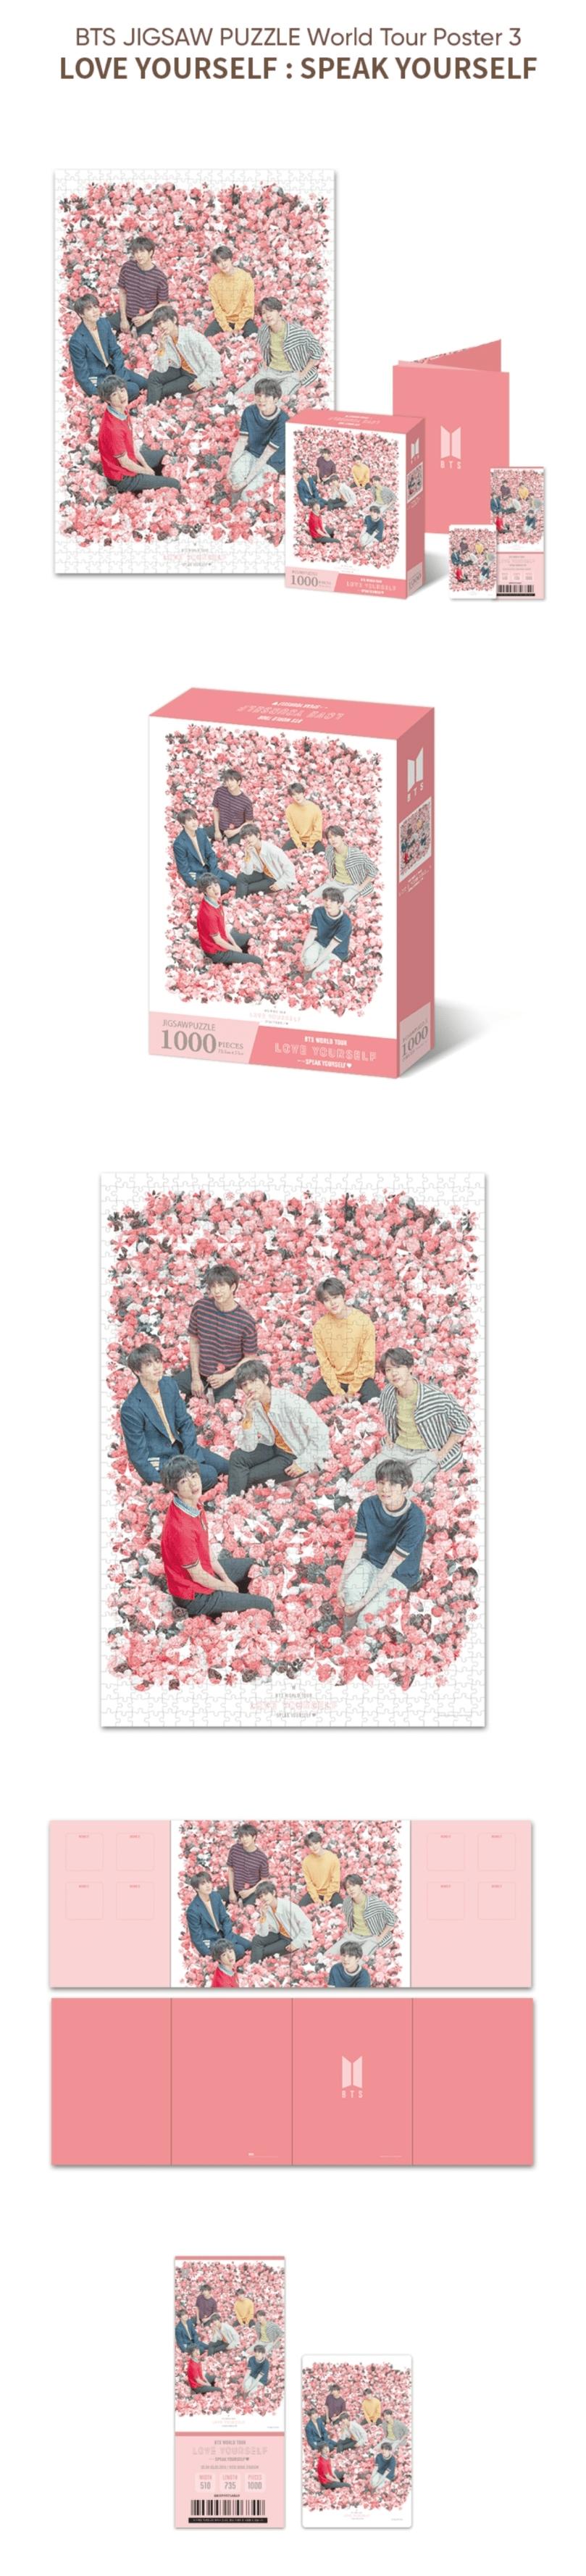 Bts World Tour Poster Jigsaw Puzzle Set Love Yourself Speak Yourself Tour Kpop Usa